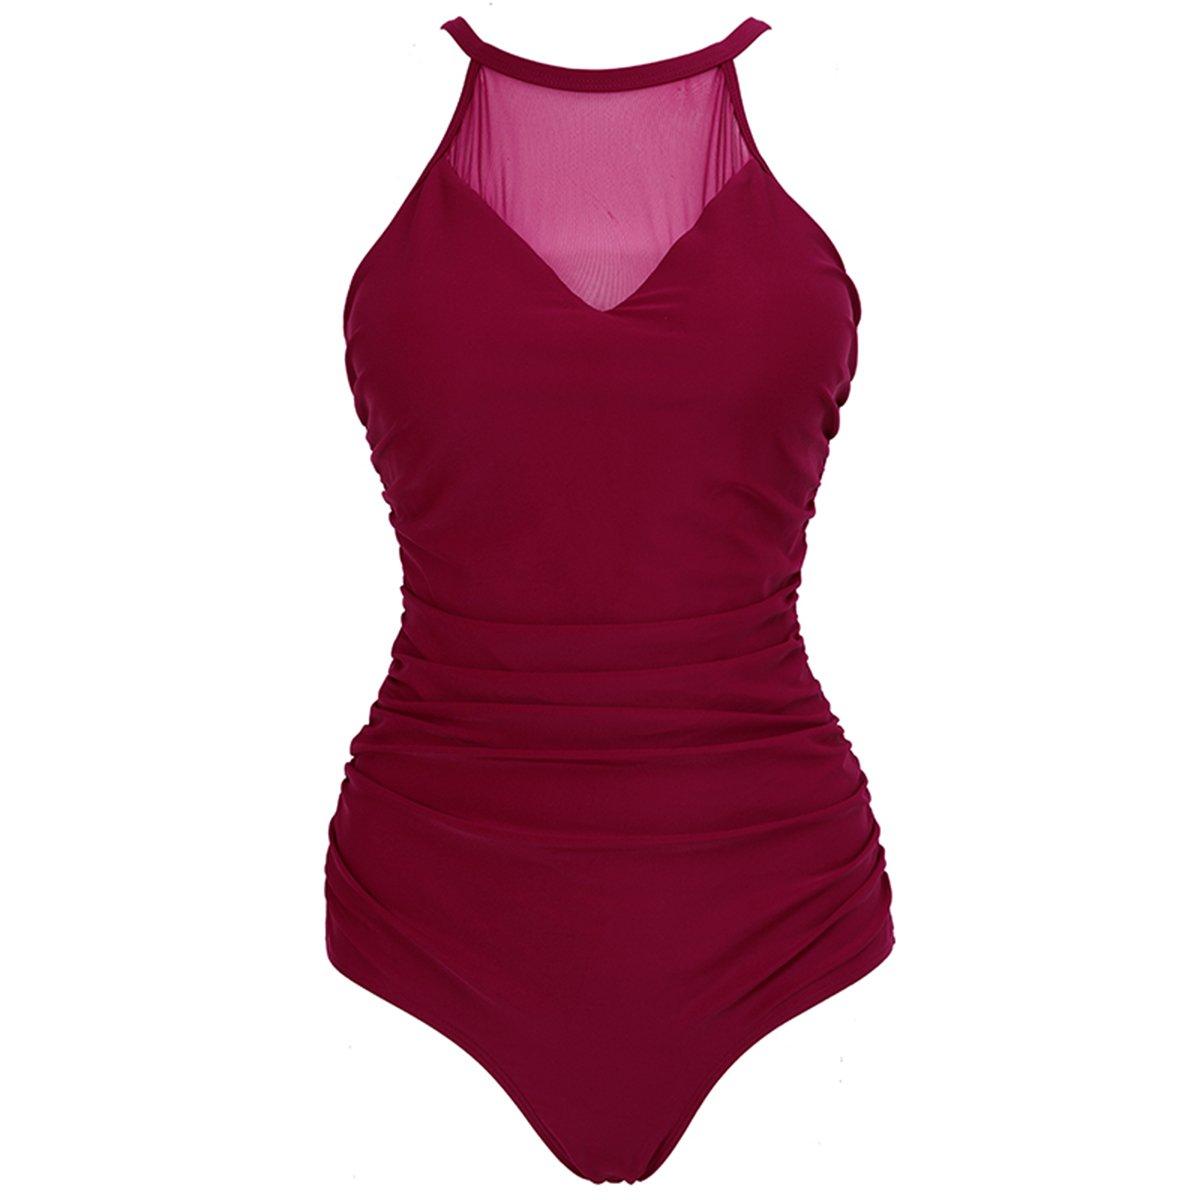 6635664cb4 LAPAYA Women s Vintage Ruched One Piece Swimsuit Mesh V Neck Plus Size  Swimwear at Amazon Women s Clothing store